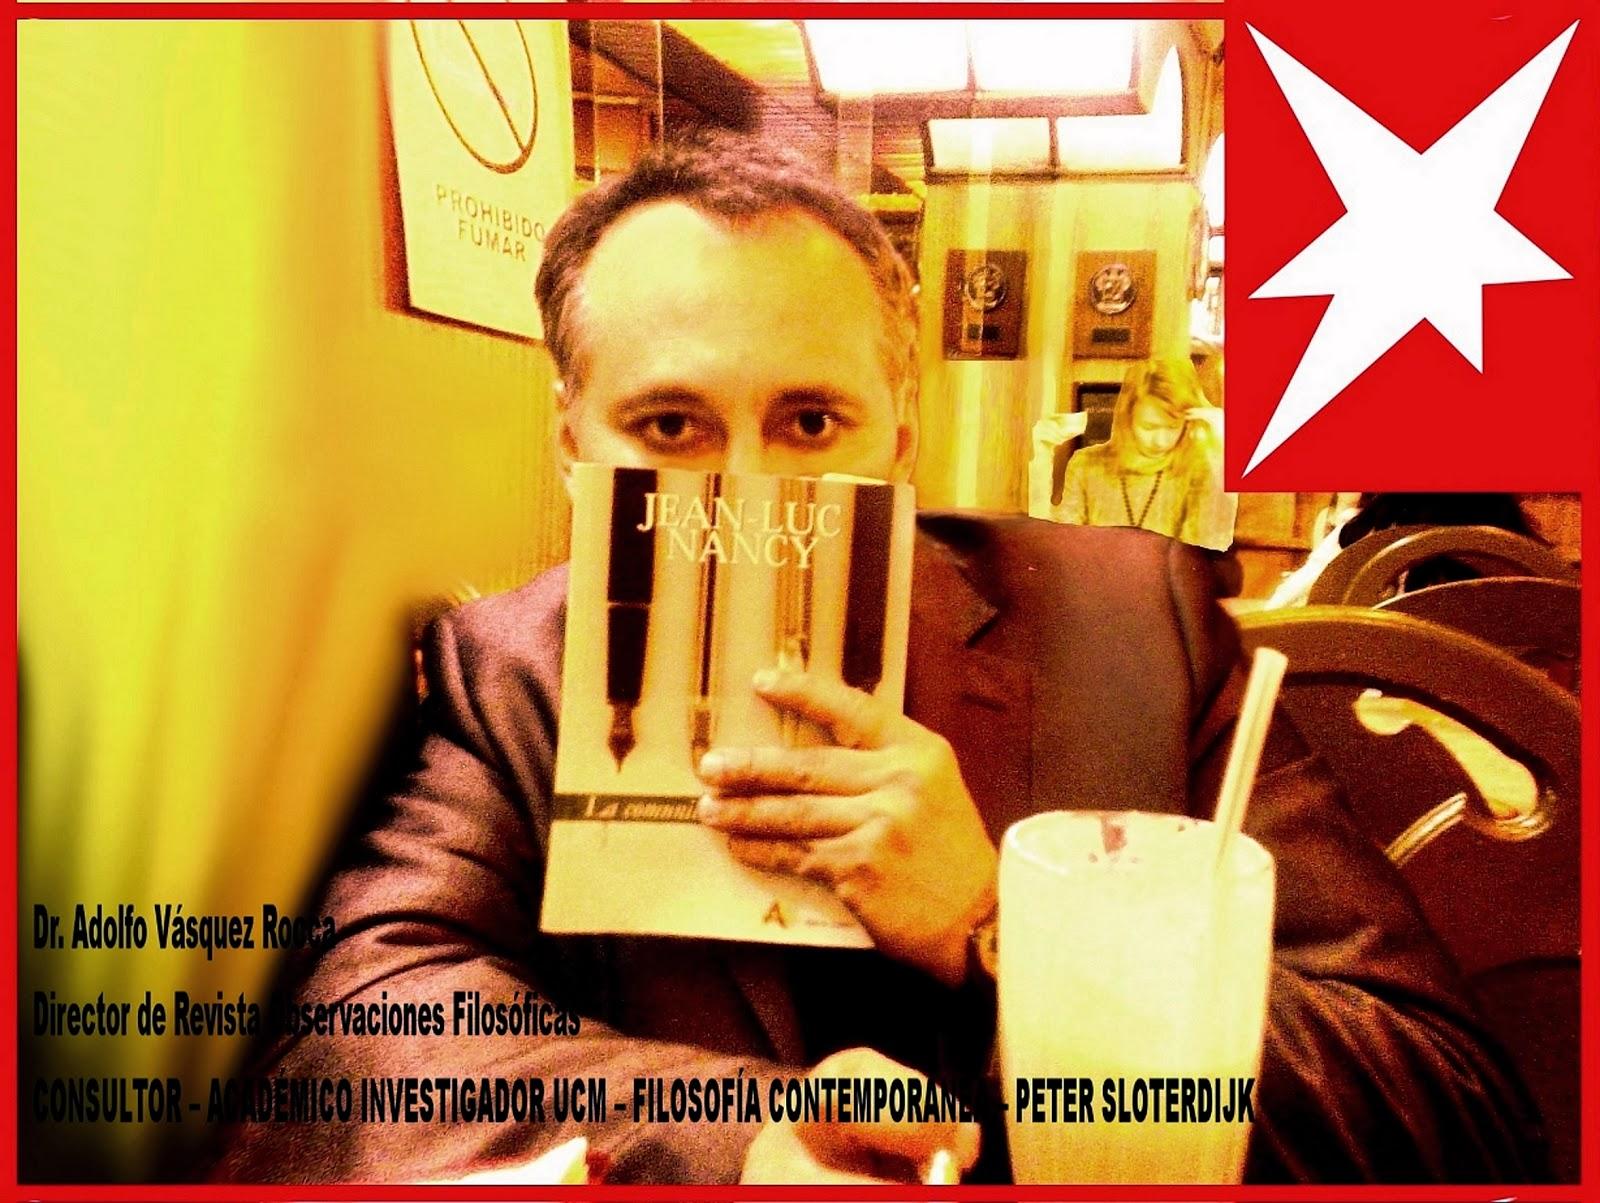 http://3.bp.blogspot.com/-4yJcqHp37NI/UxvBjJXw5MI/AAAAAAAAQrA/kBz5aL6Dzq8/s1600/ADOLFO+VASQUEZ+ROCCA+PHD._+Doctor+en+Filosofia+_++Universidad+Complutense+de+Madrid+XL+.jpeg